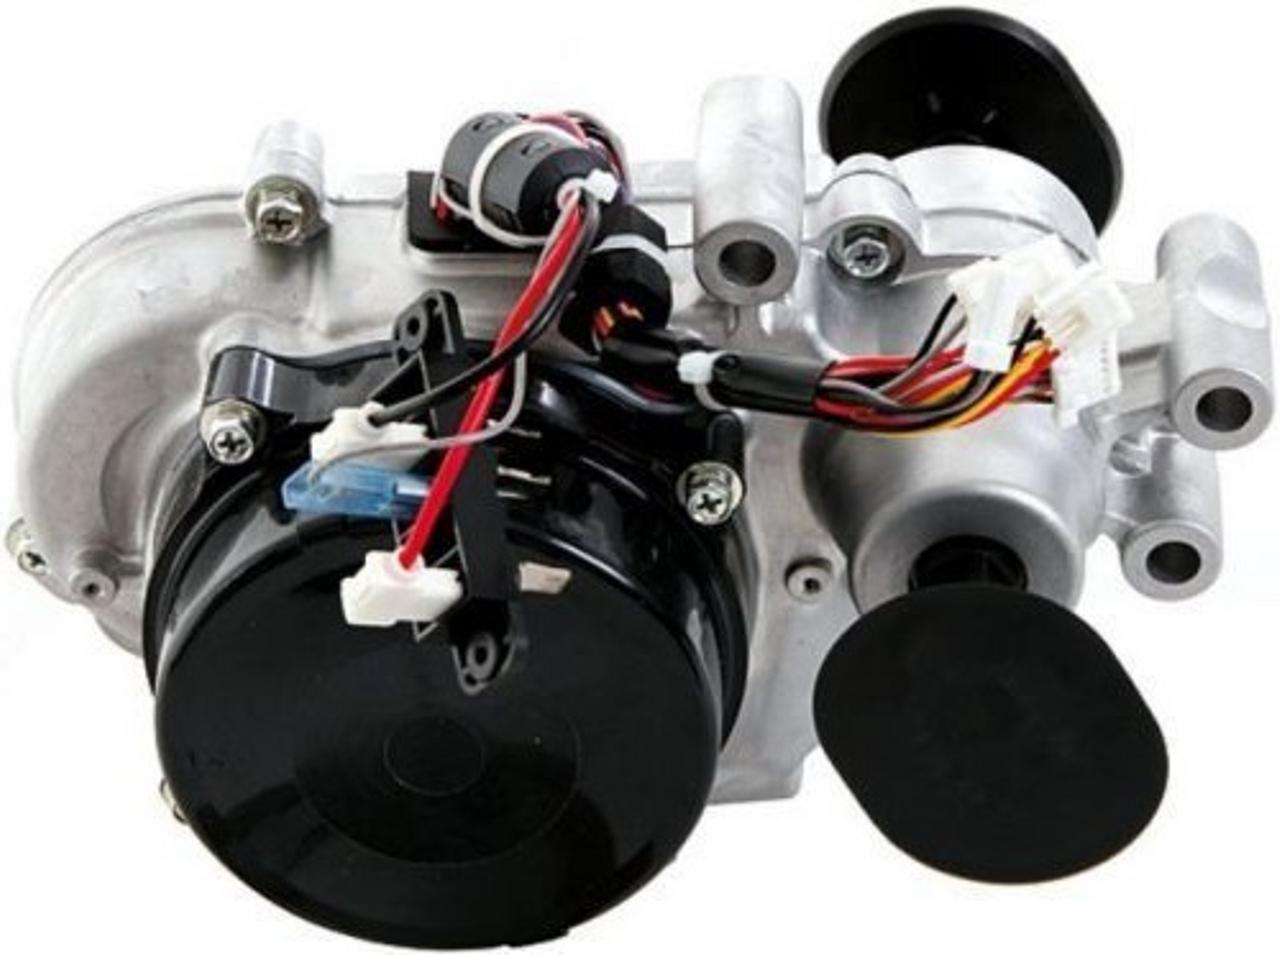 PANASONIC MOTOR für 26 Zoll 250W 36V für LCD Display